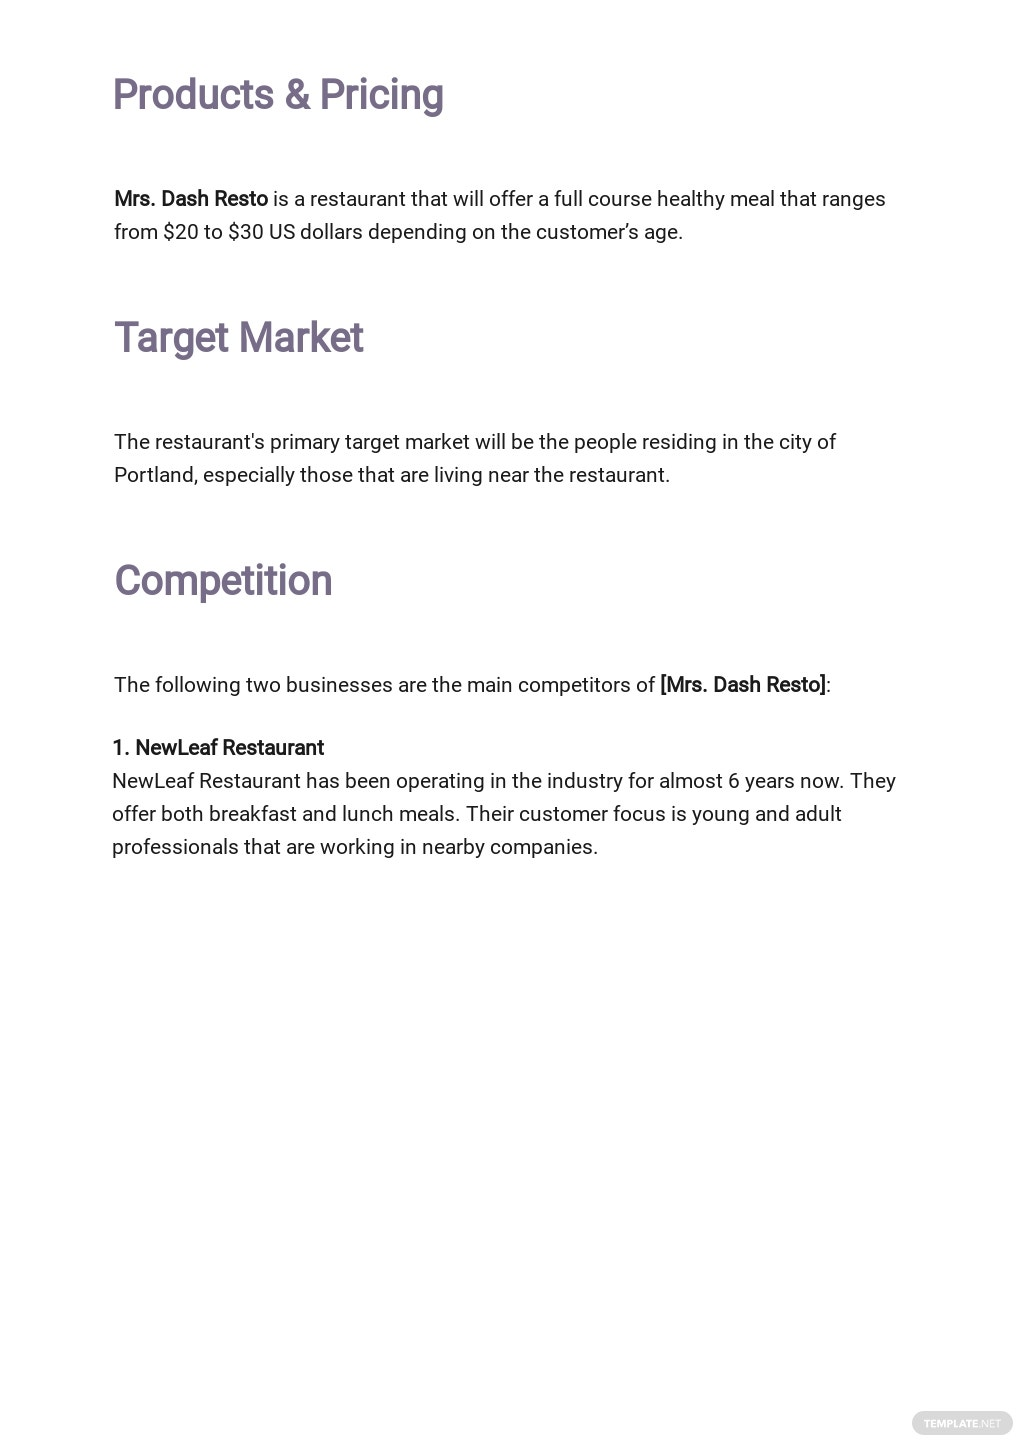 Restaurant Business Plan Outline Template 2.jpe